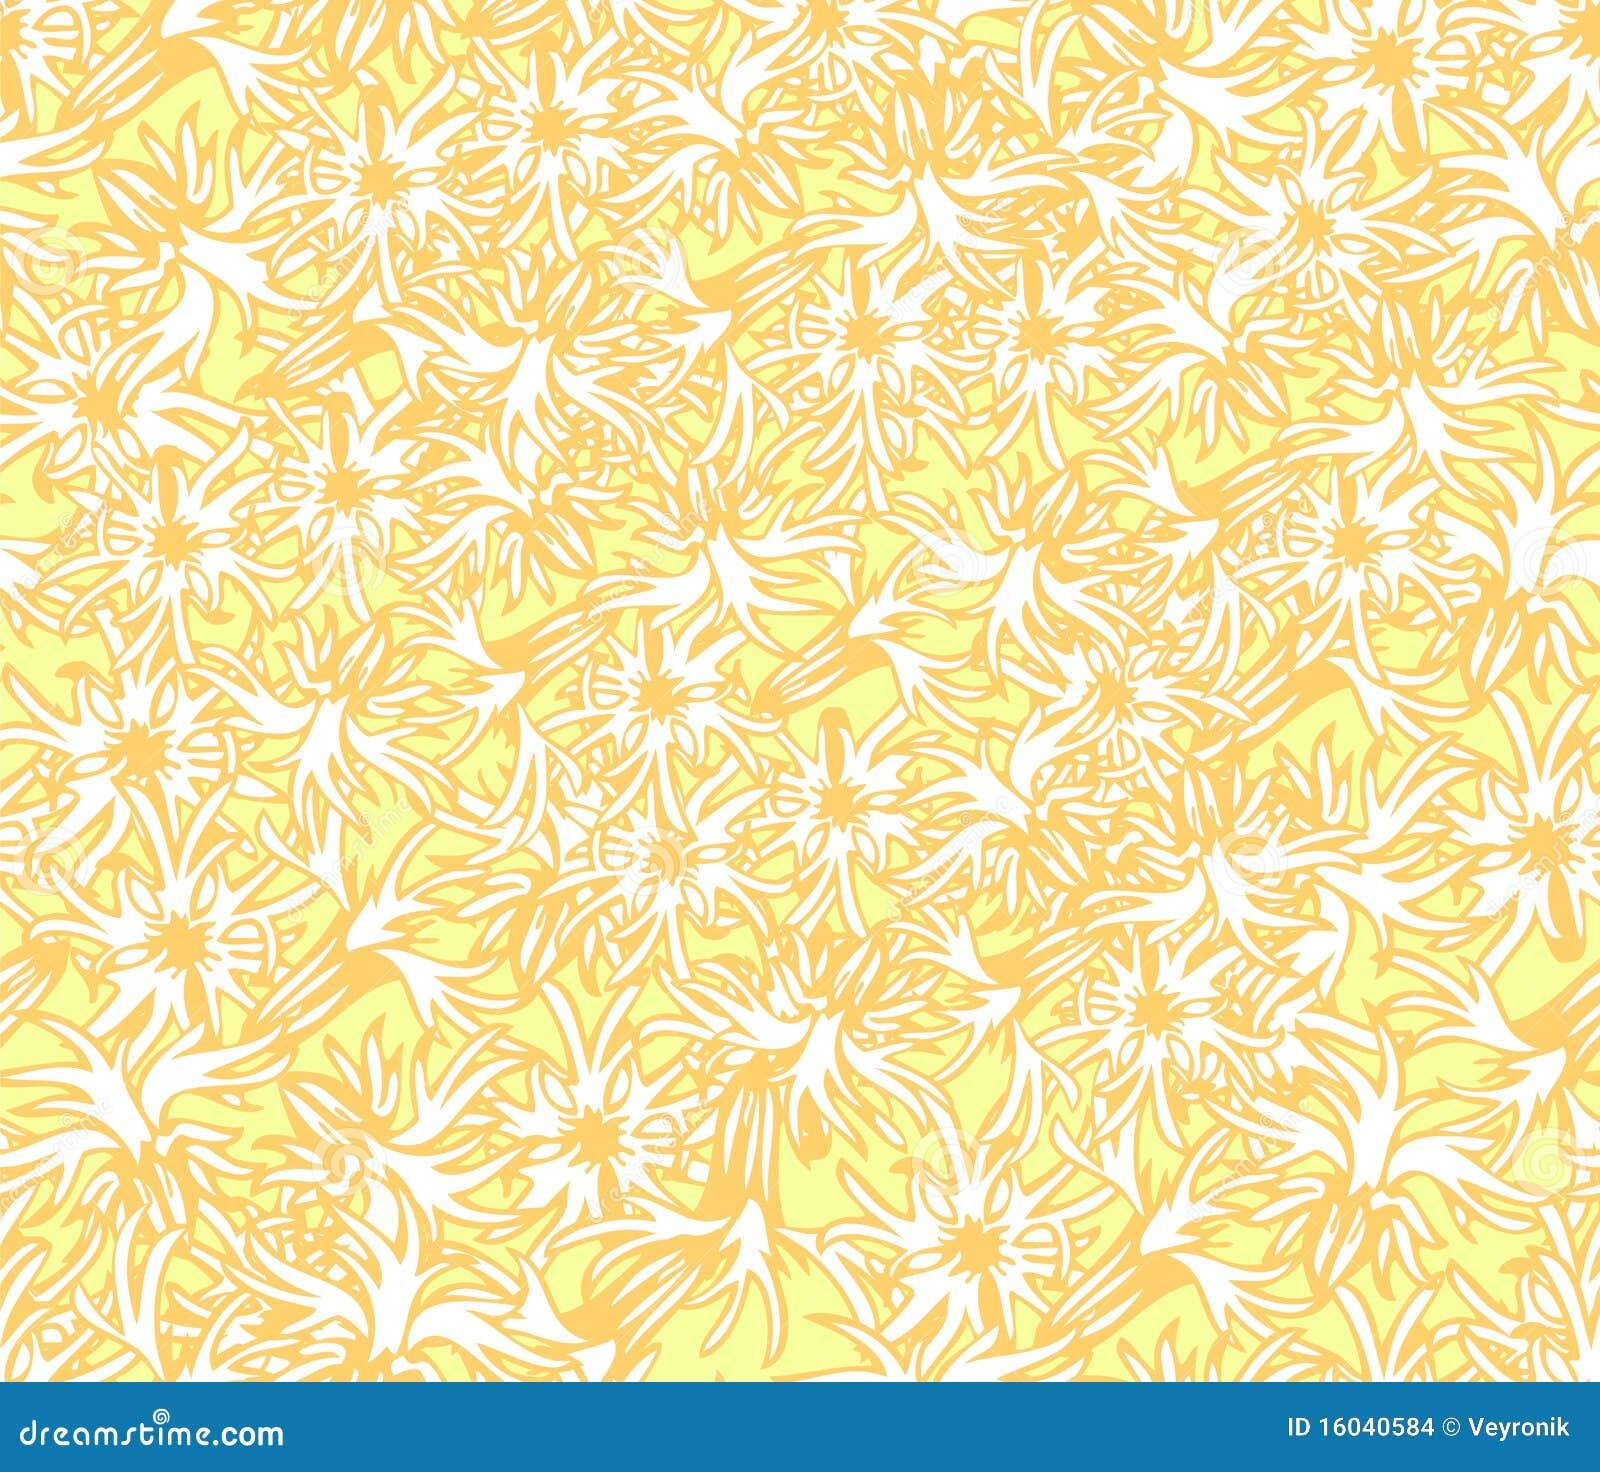 Papel De Parede Floral Amarelo Imagens Stock Imagem